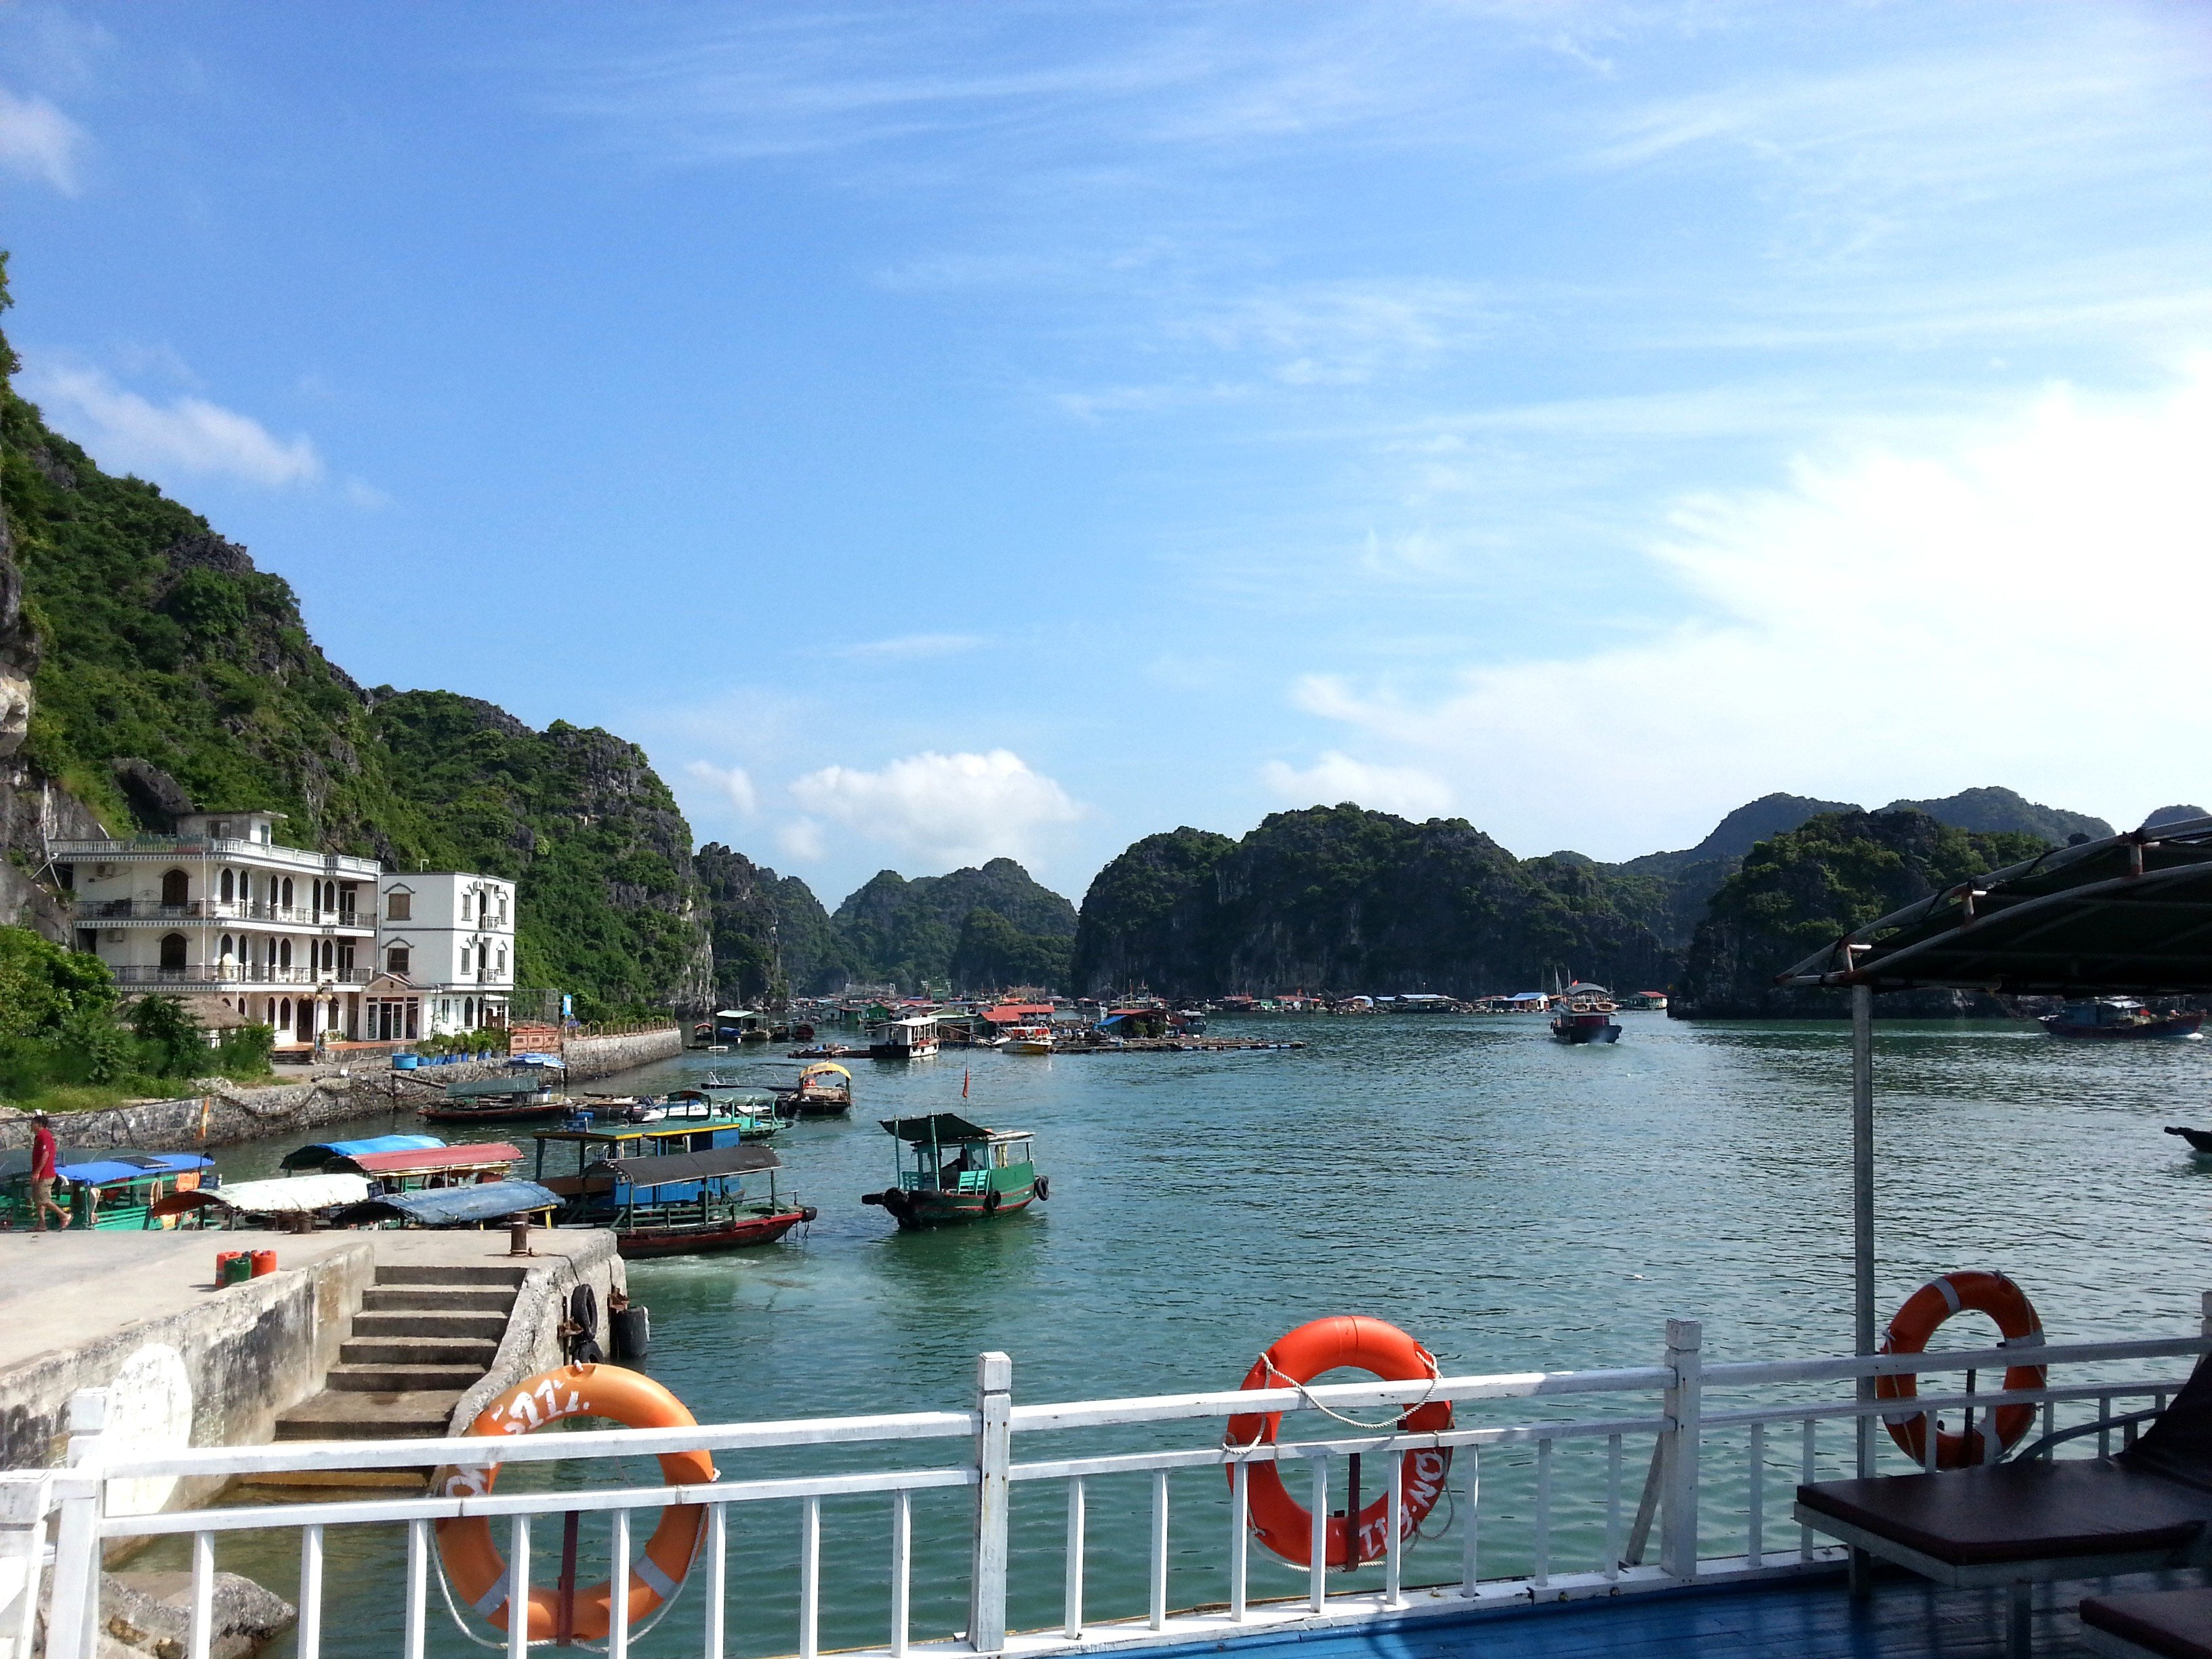 Tours around Lan Ha Bay depart from Ben Beo Harbour